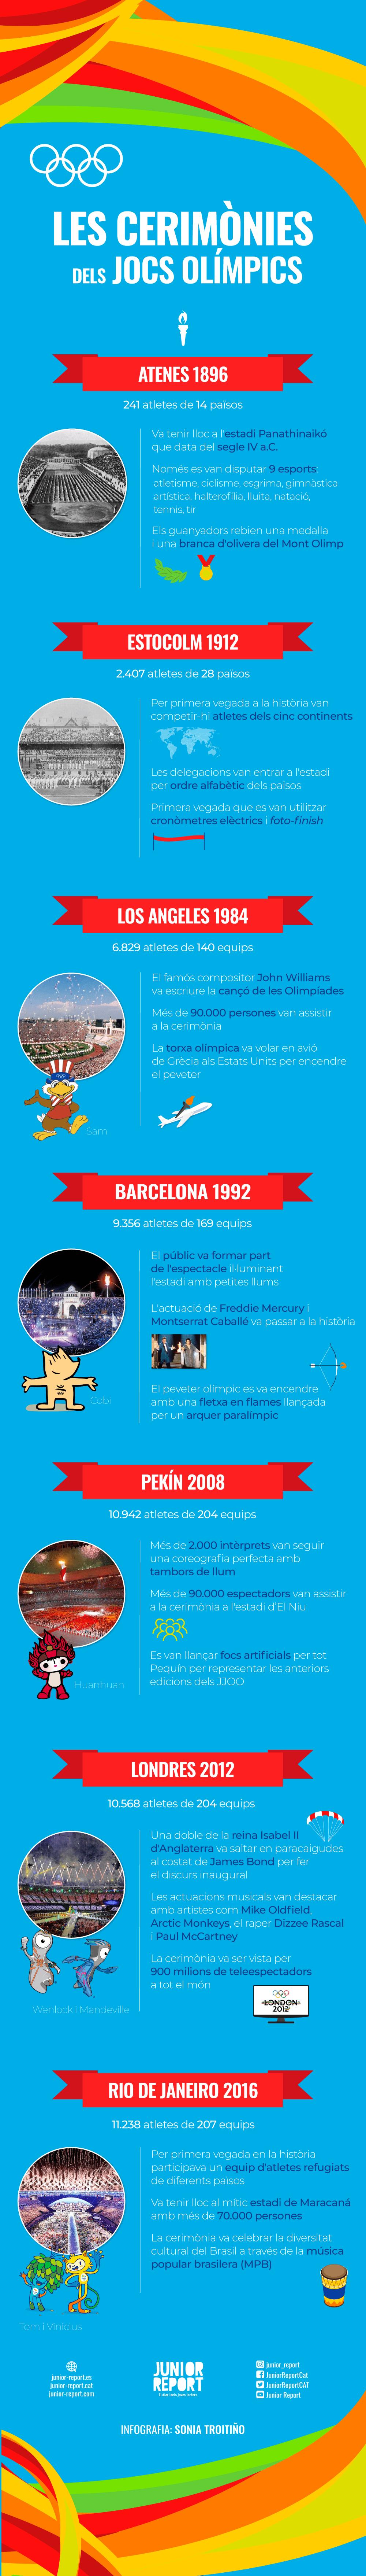 Infografia Cerimònies Jocs Olímpics